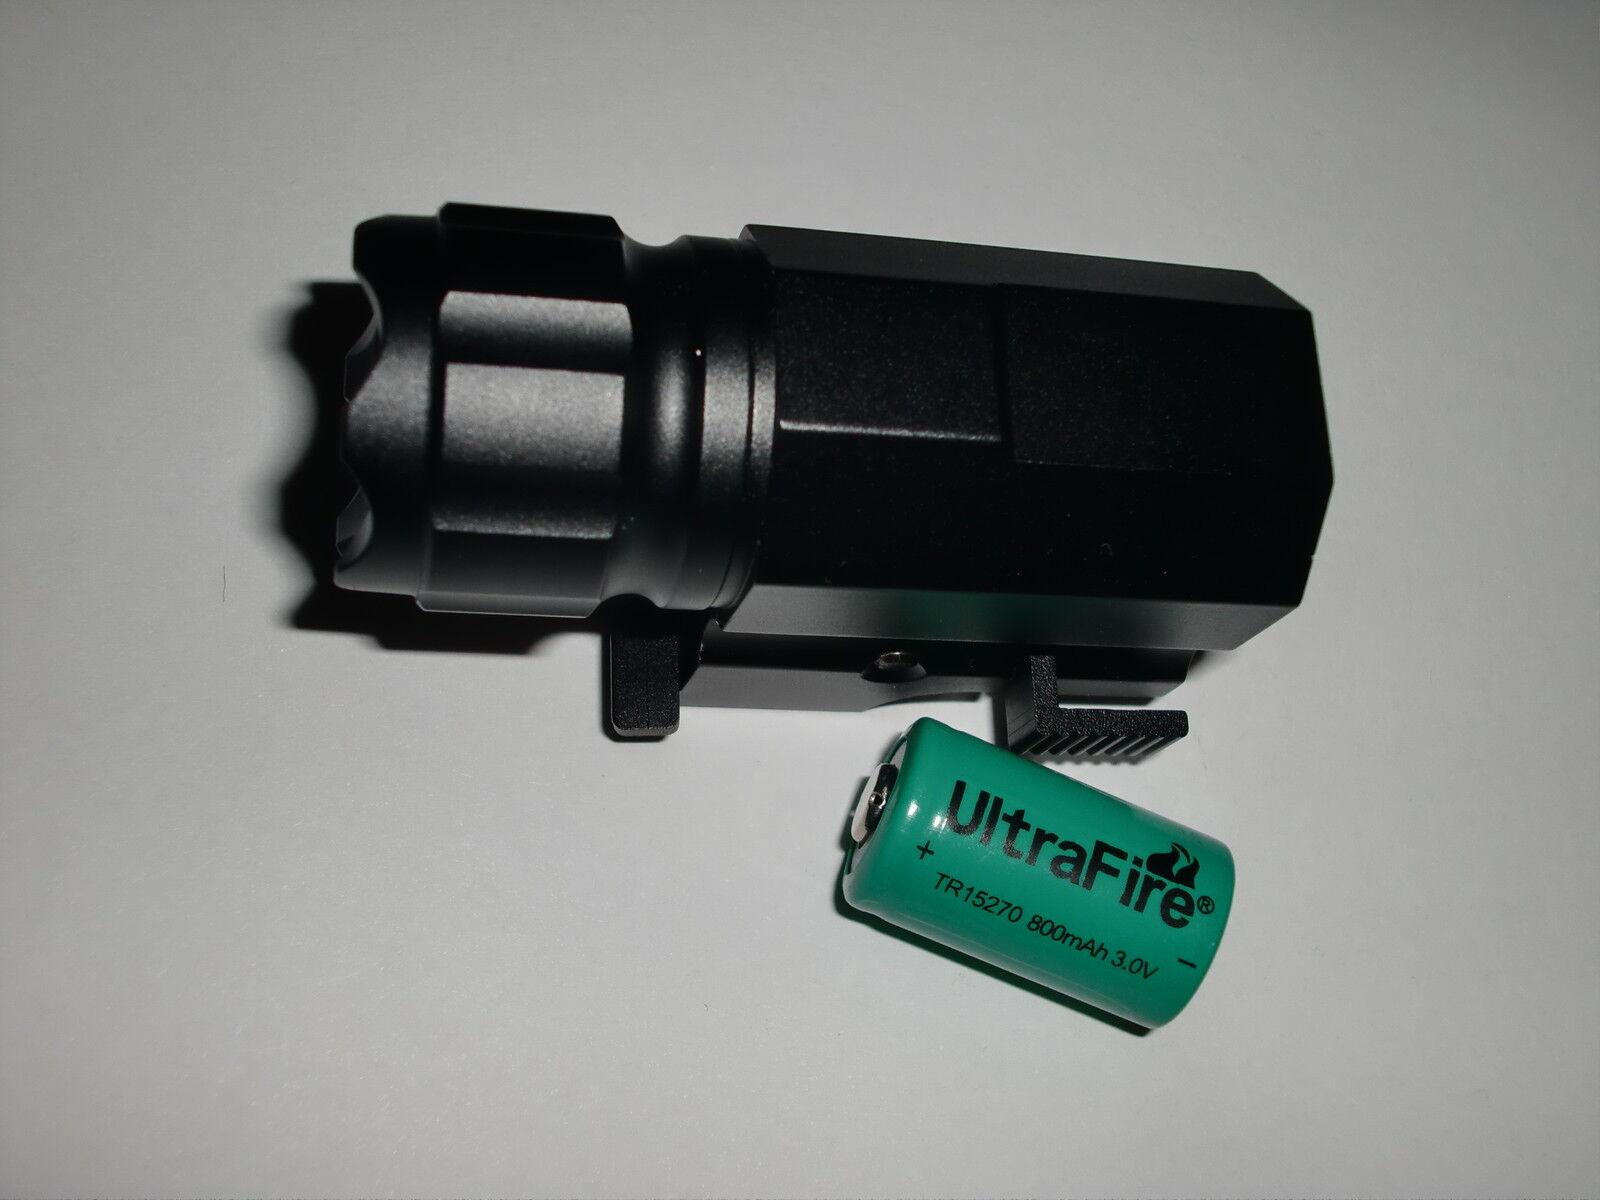 COMUNITE G03 600LM Tactical CREE LED Gun Light CR2 Rail Mount Pistol Flashlight